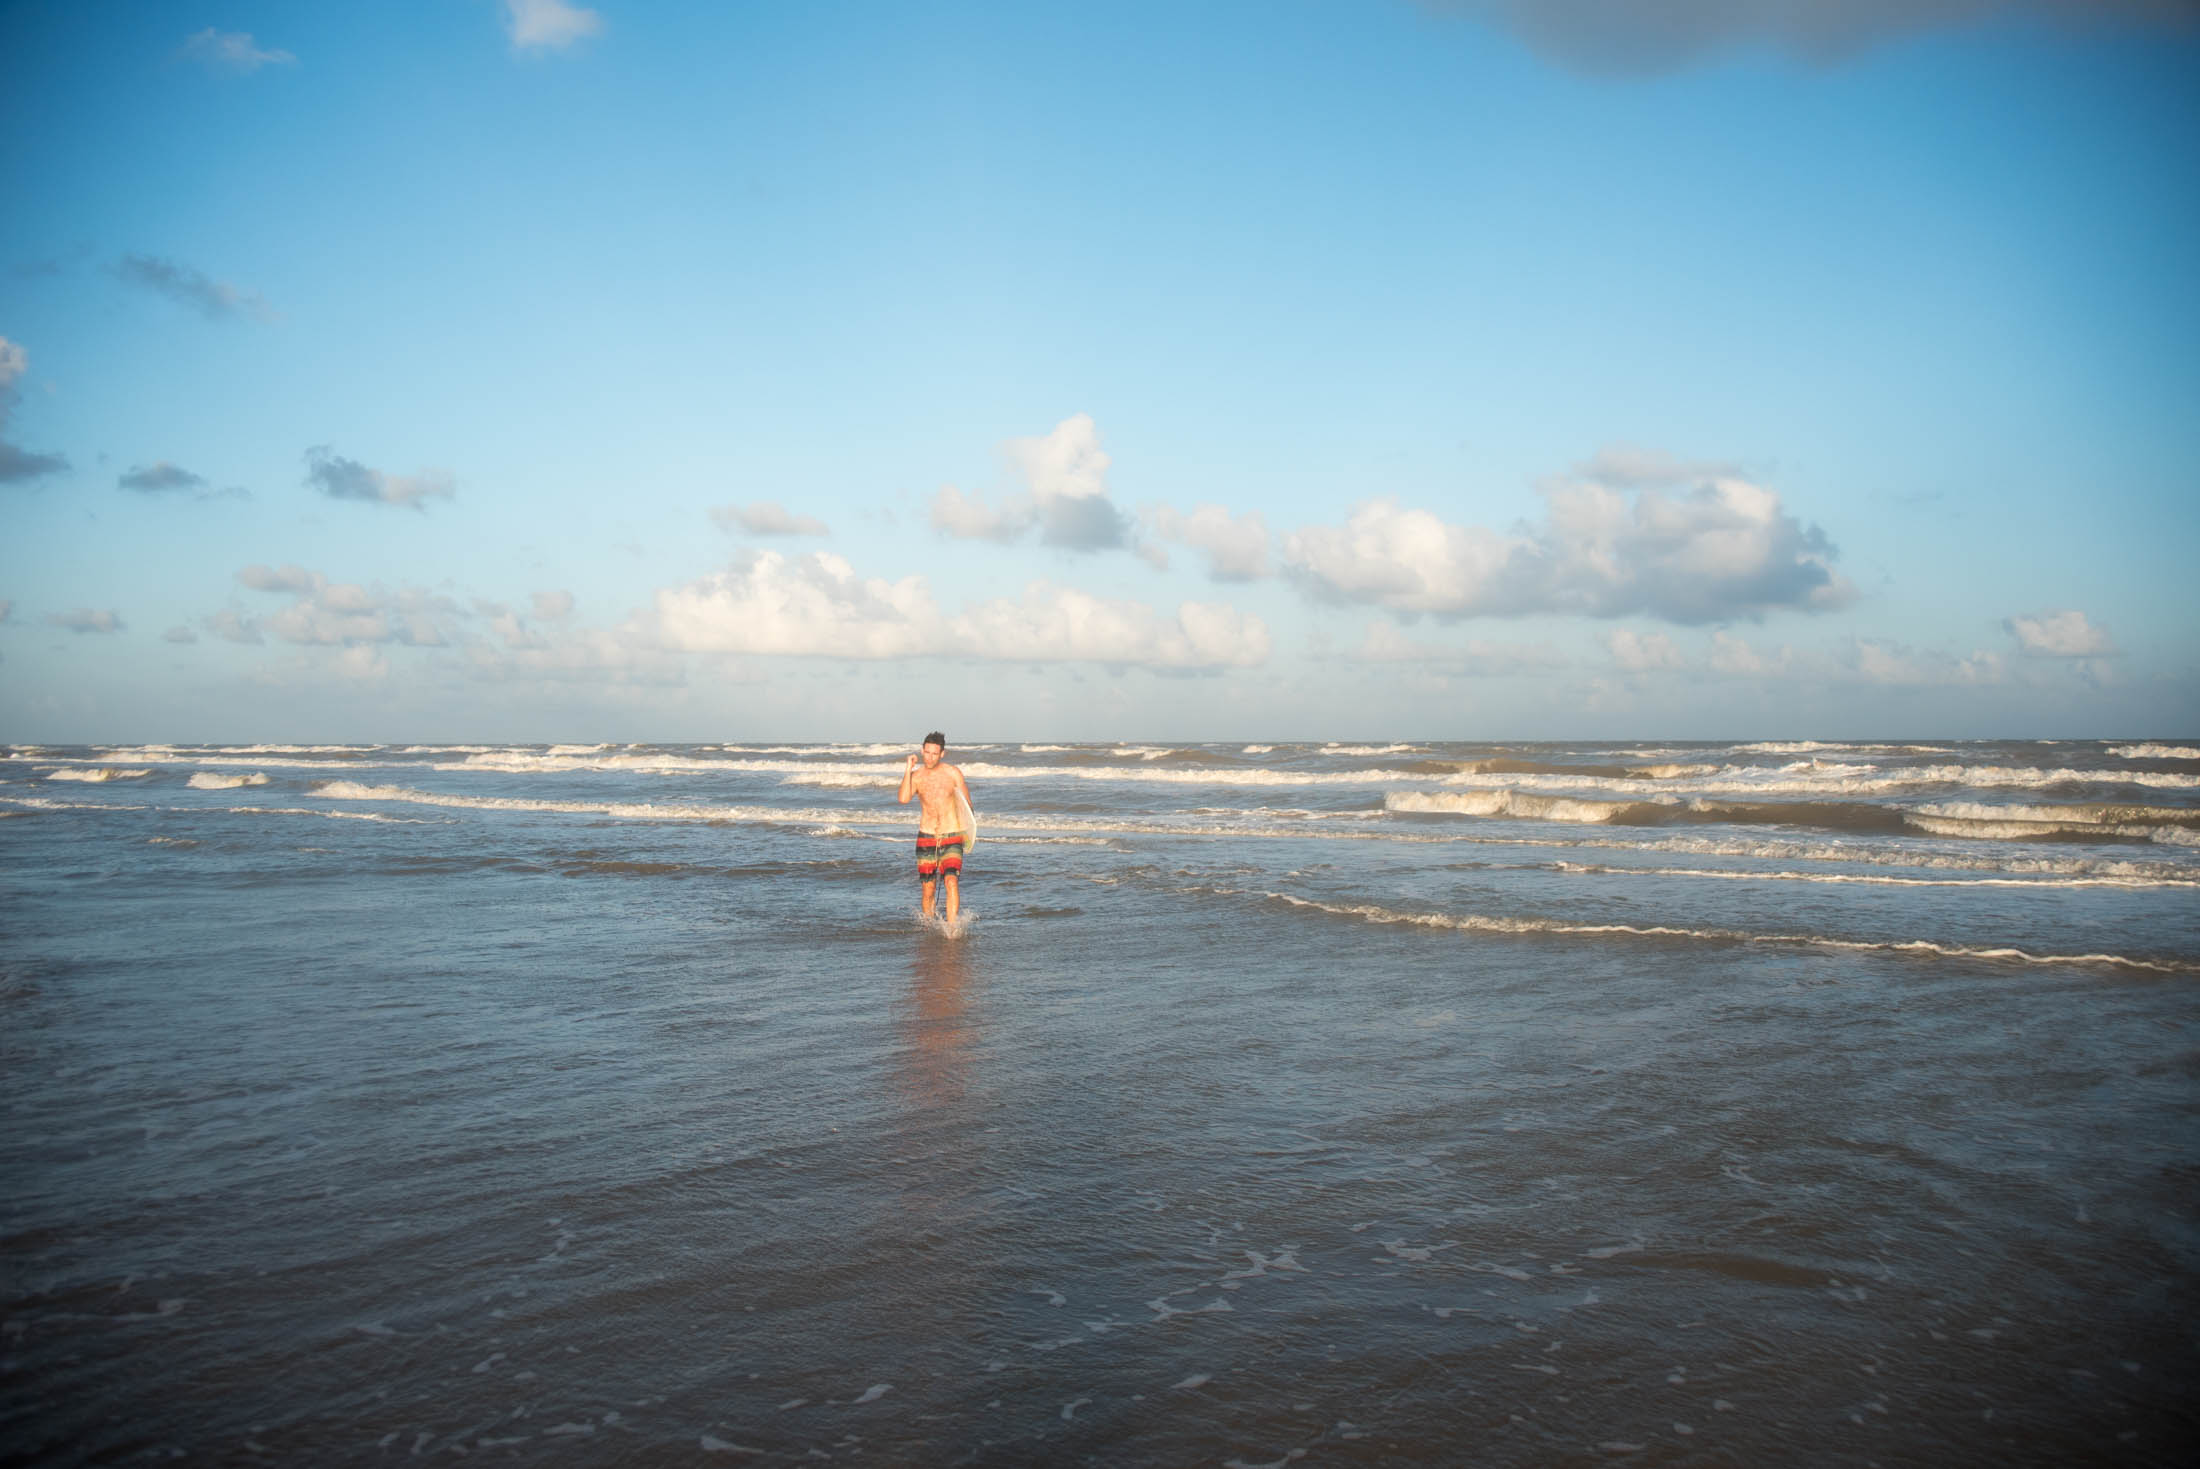 matagorda-beach-july-fourth-18